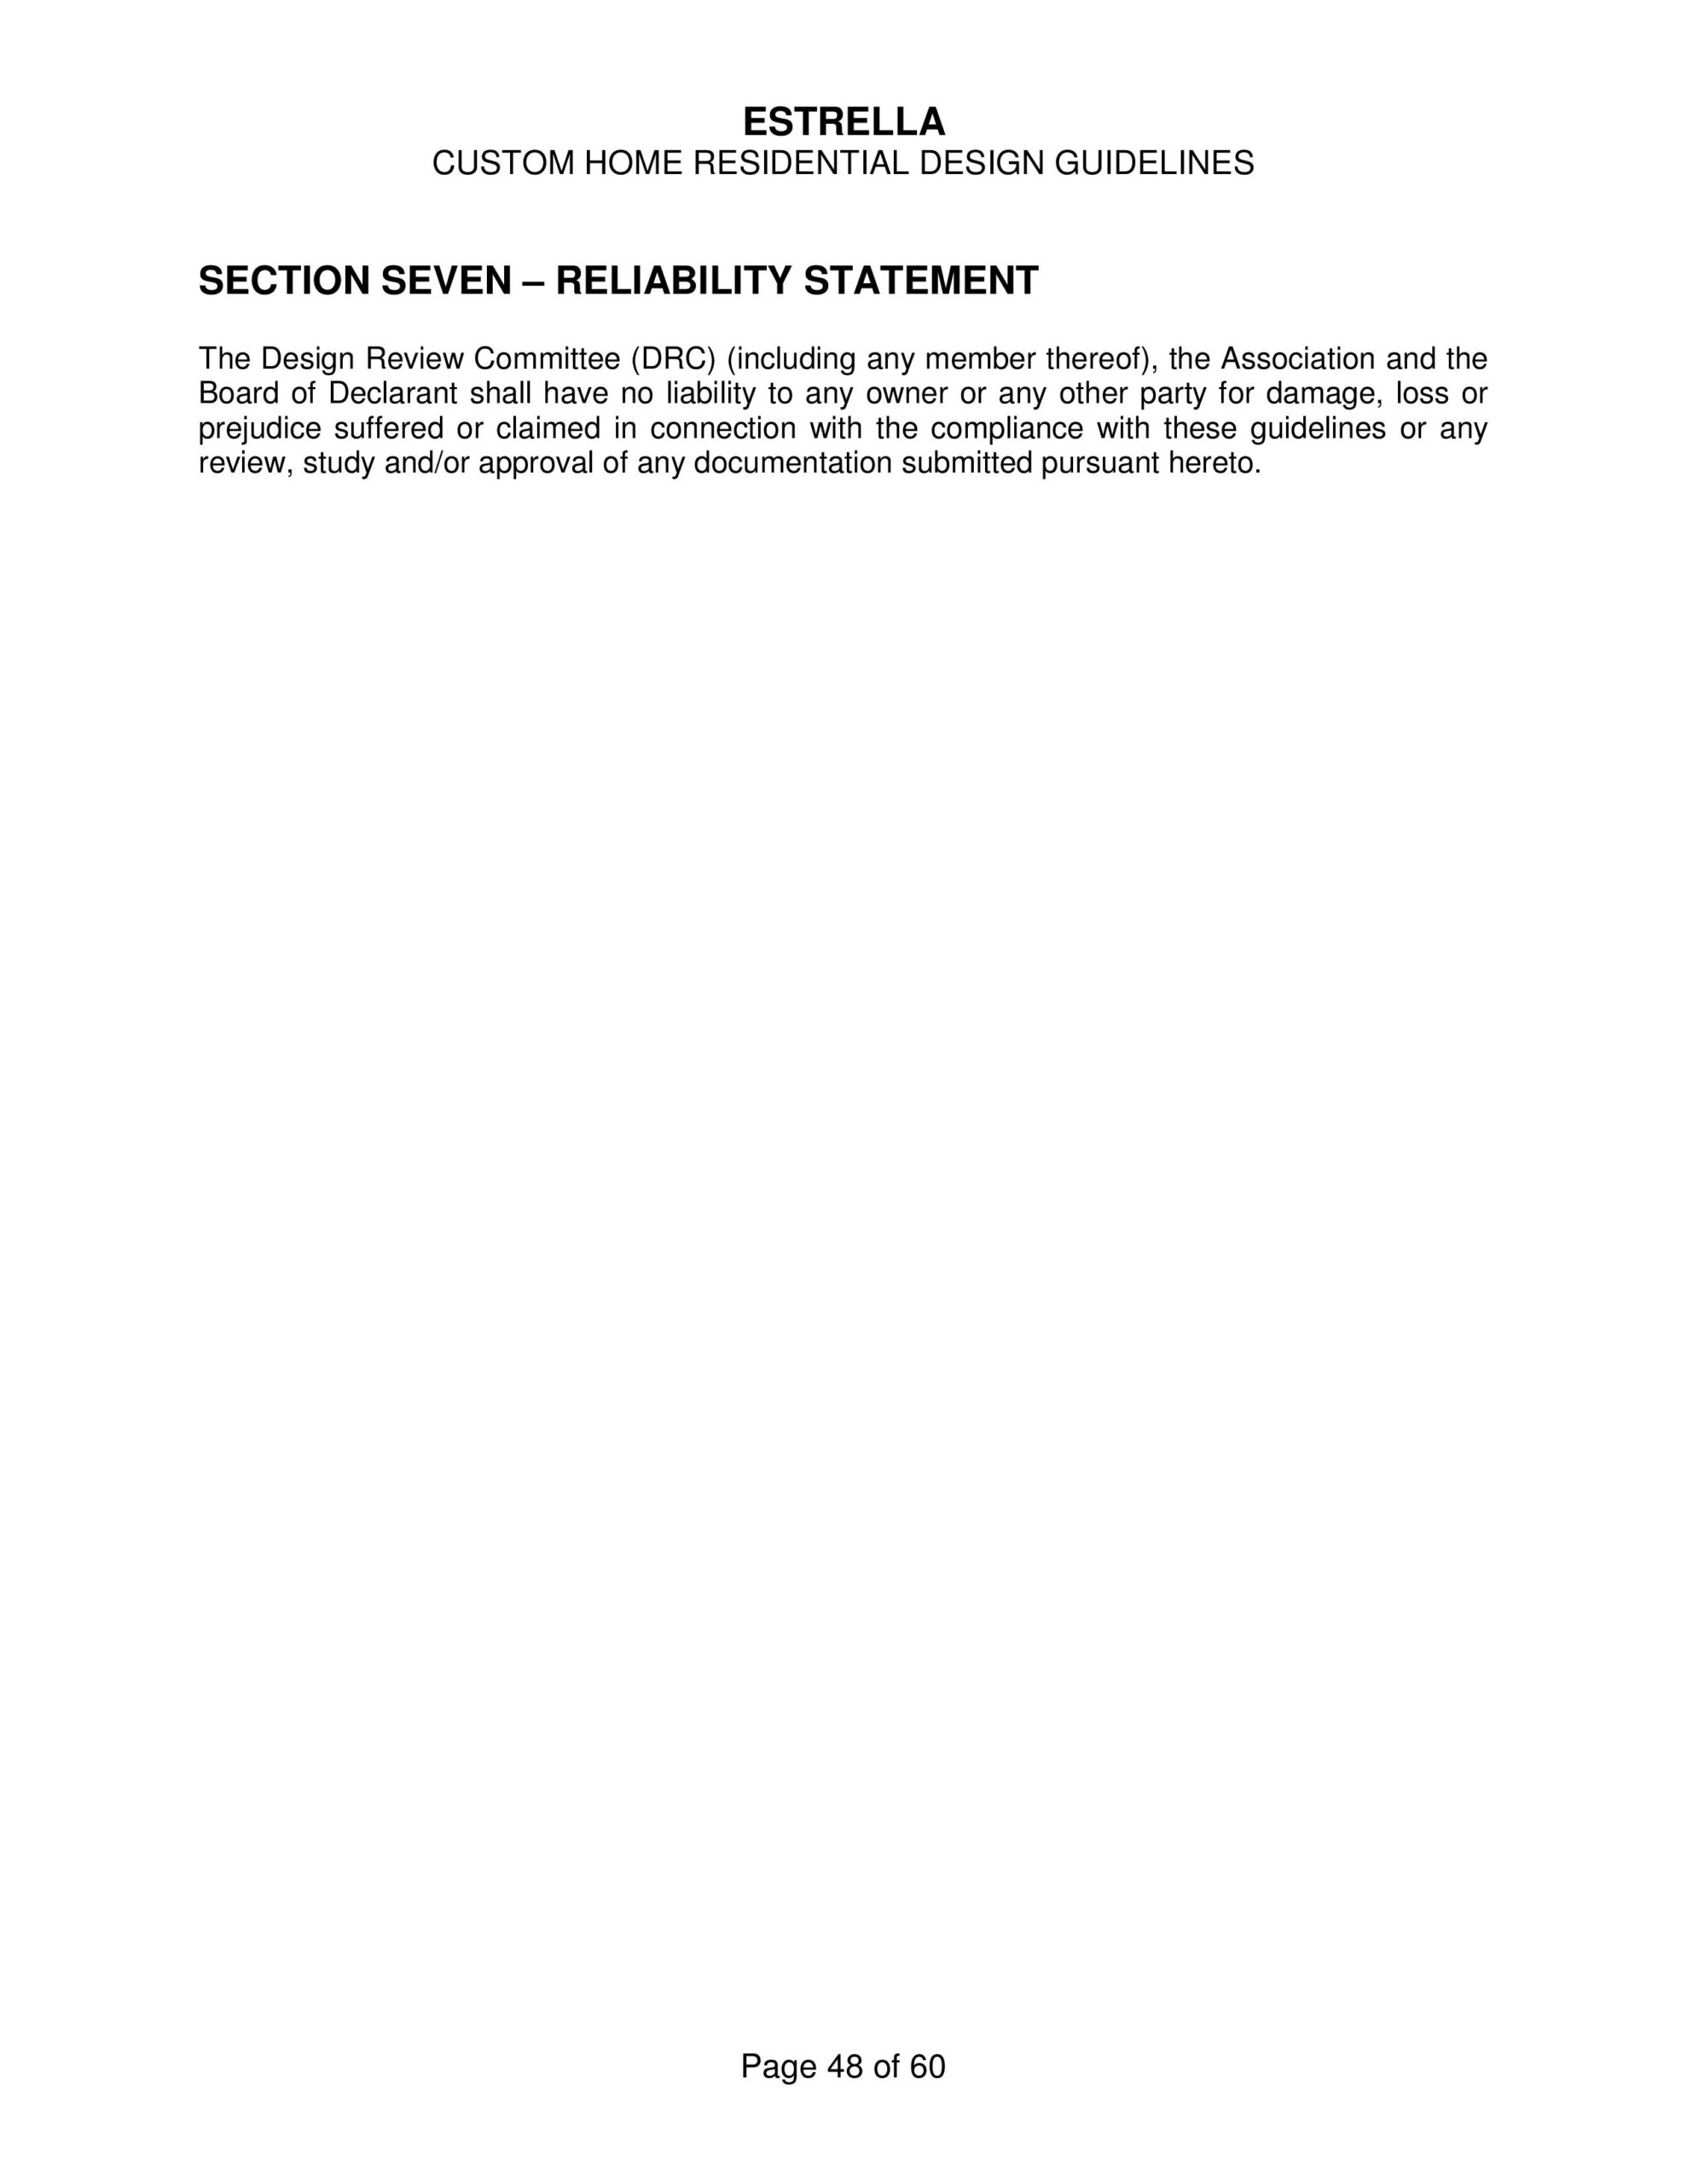 ESTRELLA MOUNTAIN CUSTOM HOME GUIDELINES-page-052